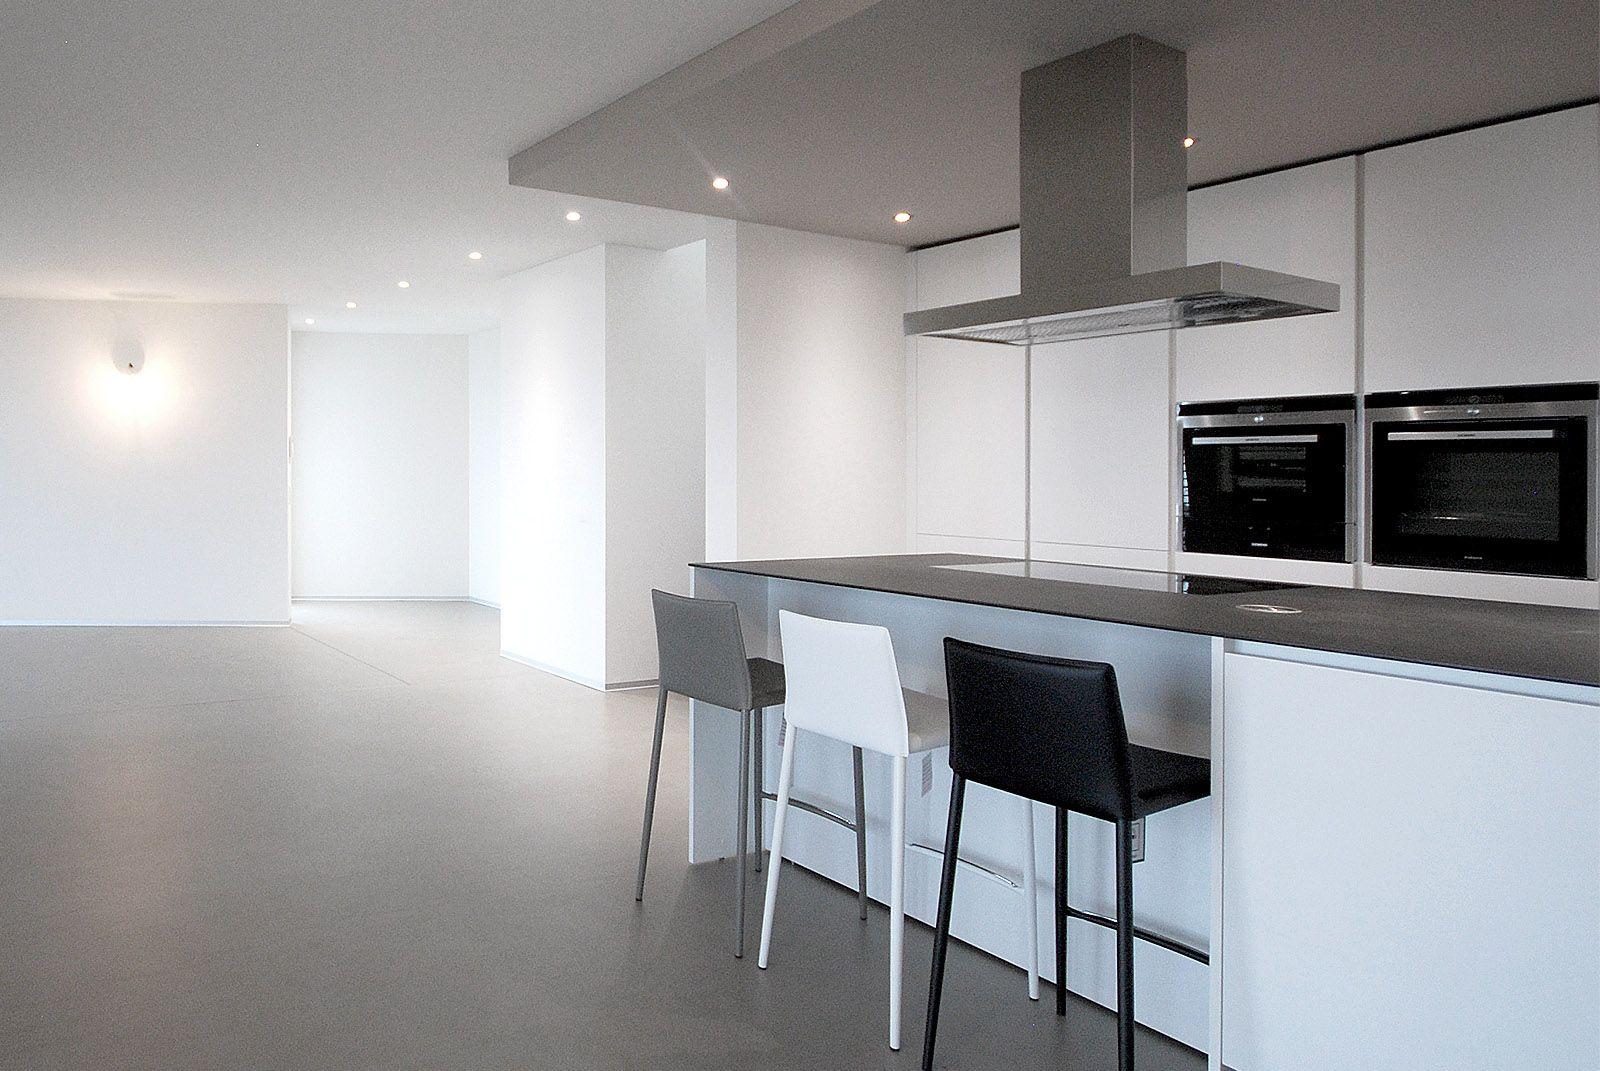 Progetto cucina varenna poliform cucina moderna di design laccata opaca con piano in ceramica - Cucina moderna design ...